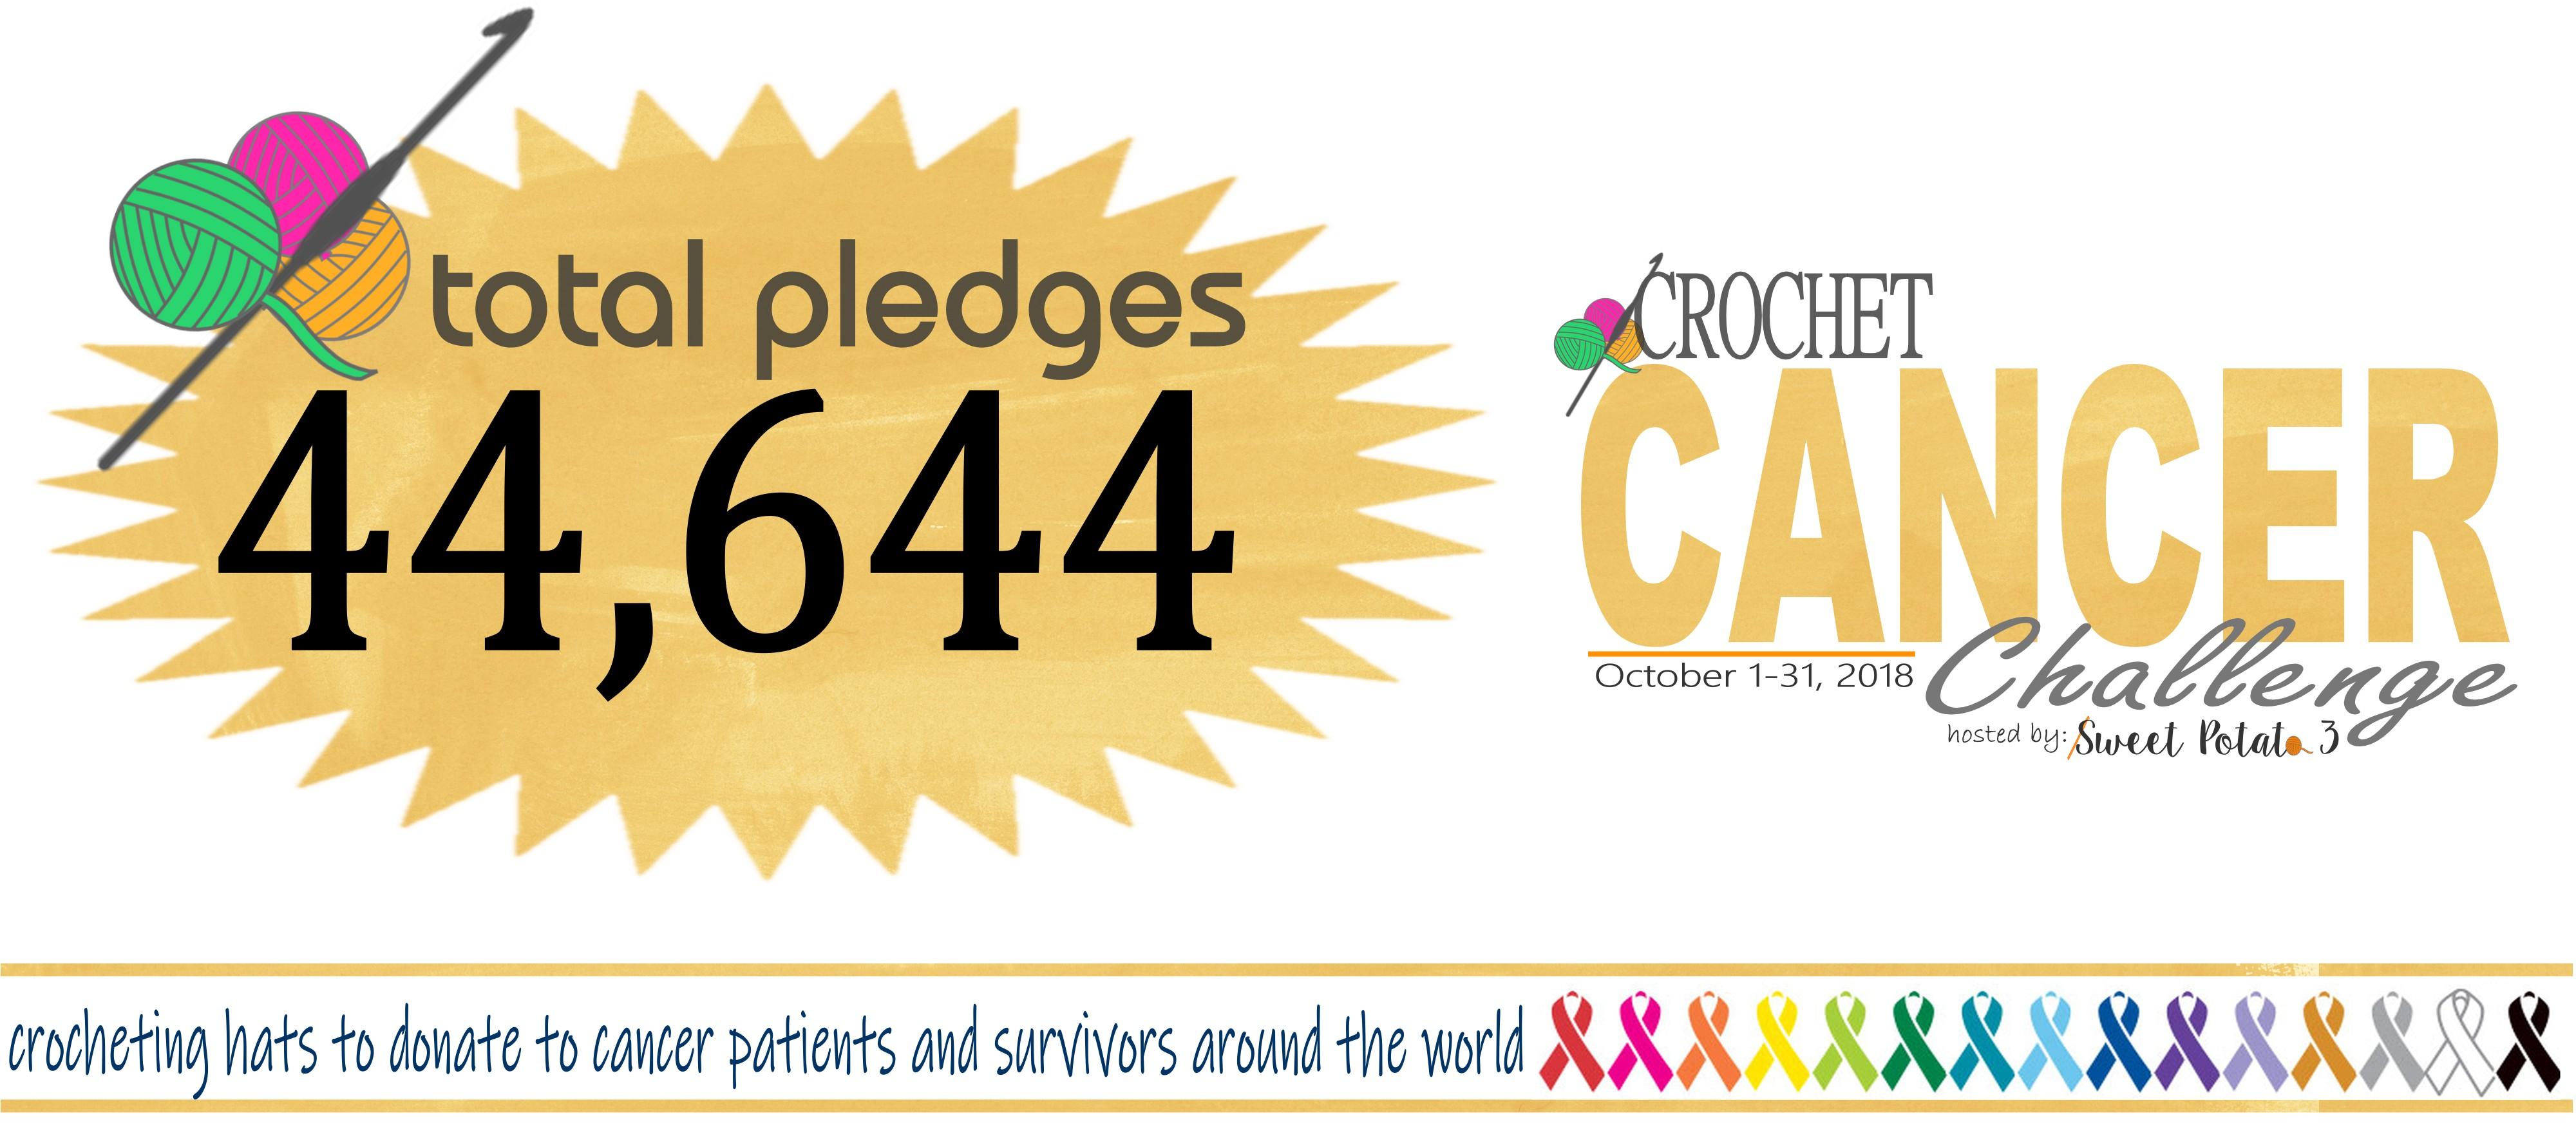 2018 Crochet Cancer Challenge Final Pledges